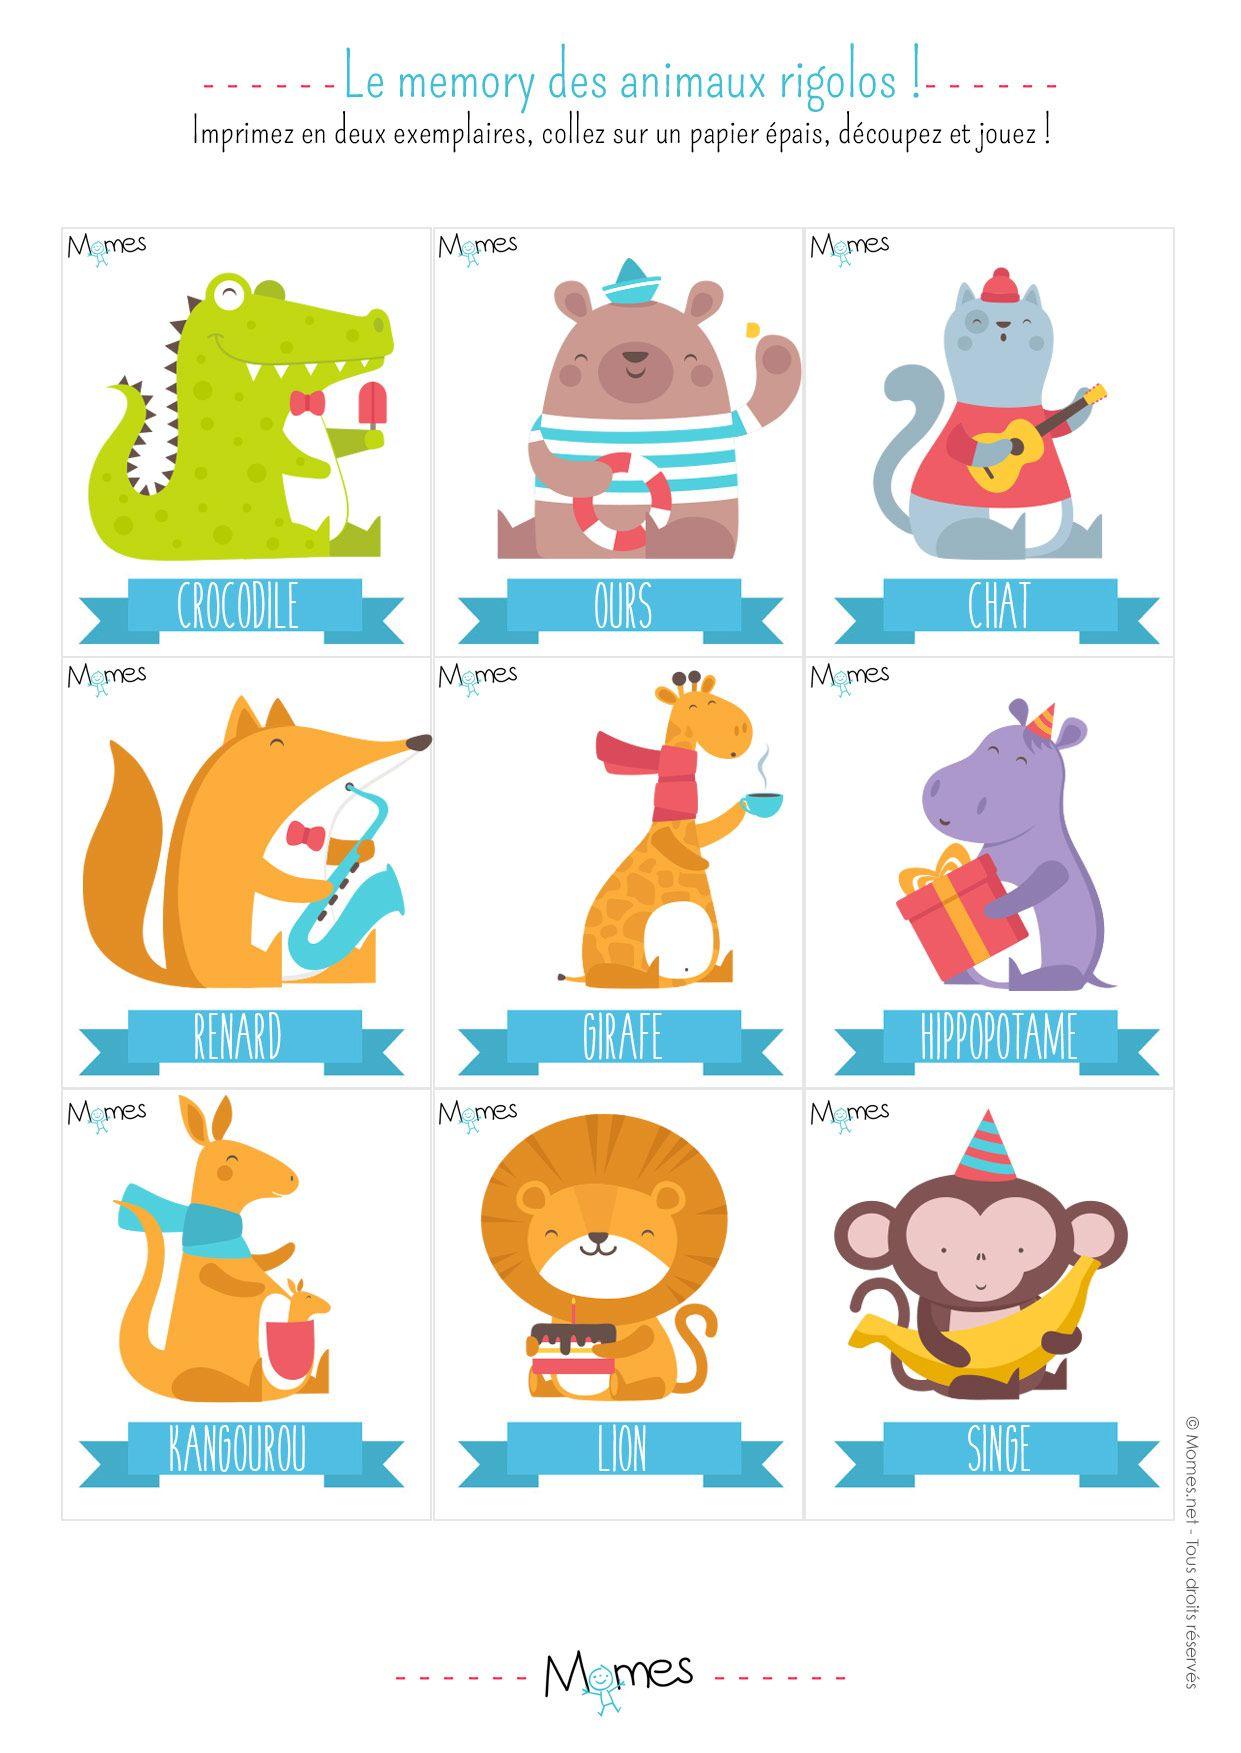 Memory animaux jeu imprimer accueil loisirs - Animaux a imprimer ...